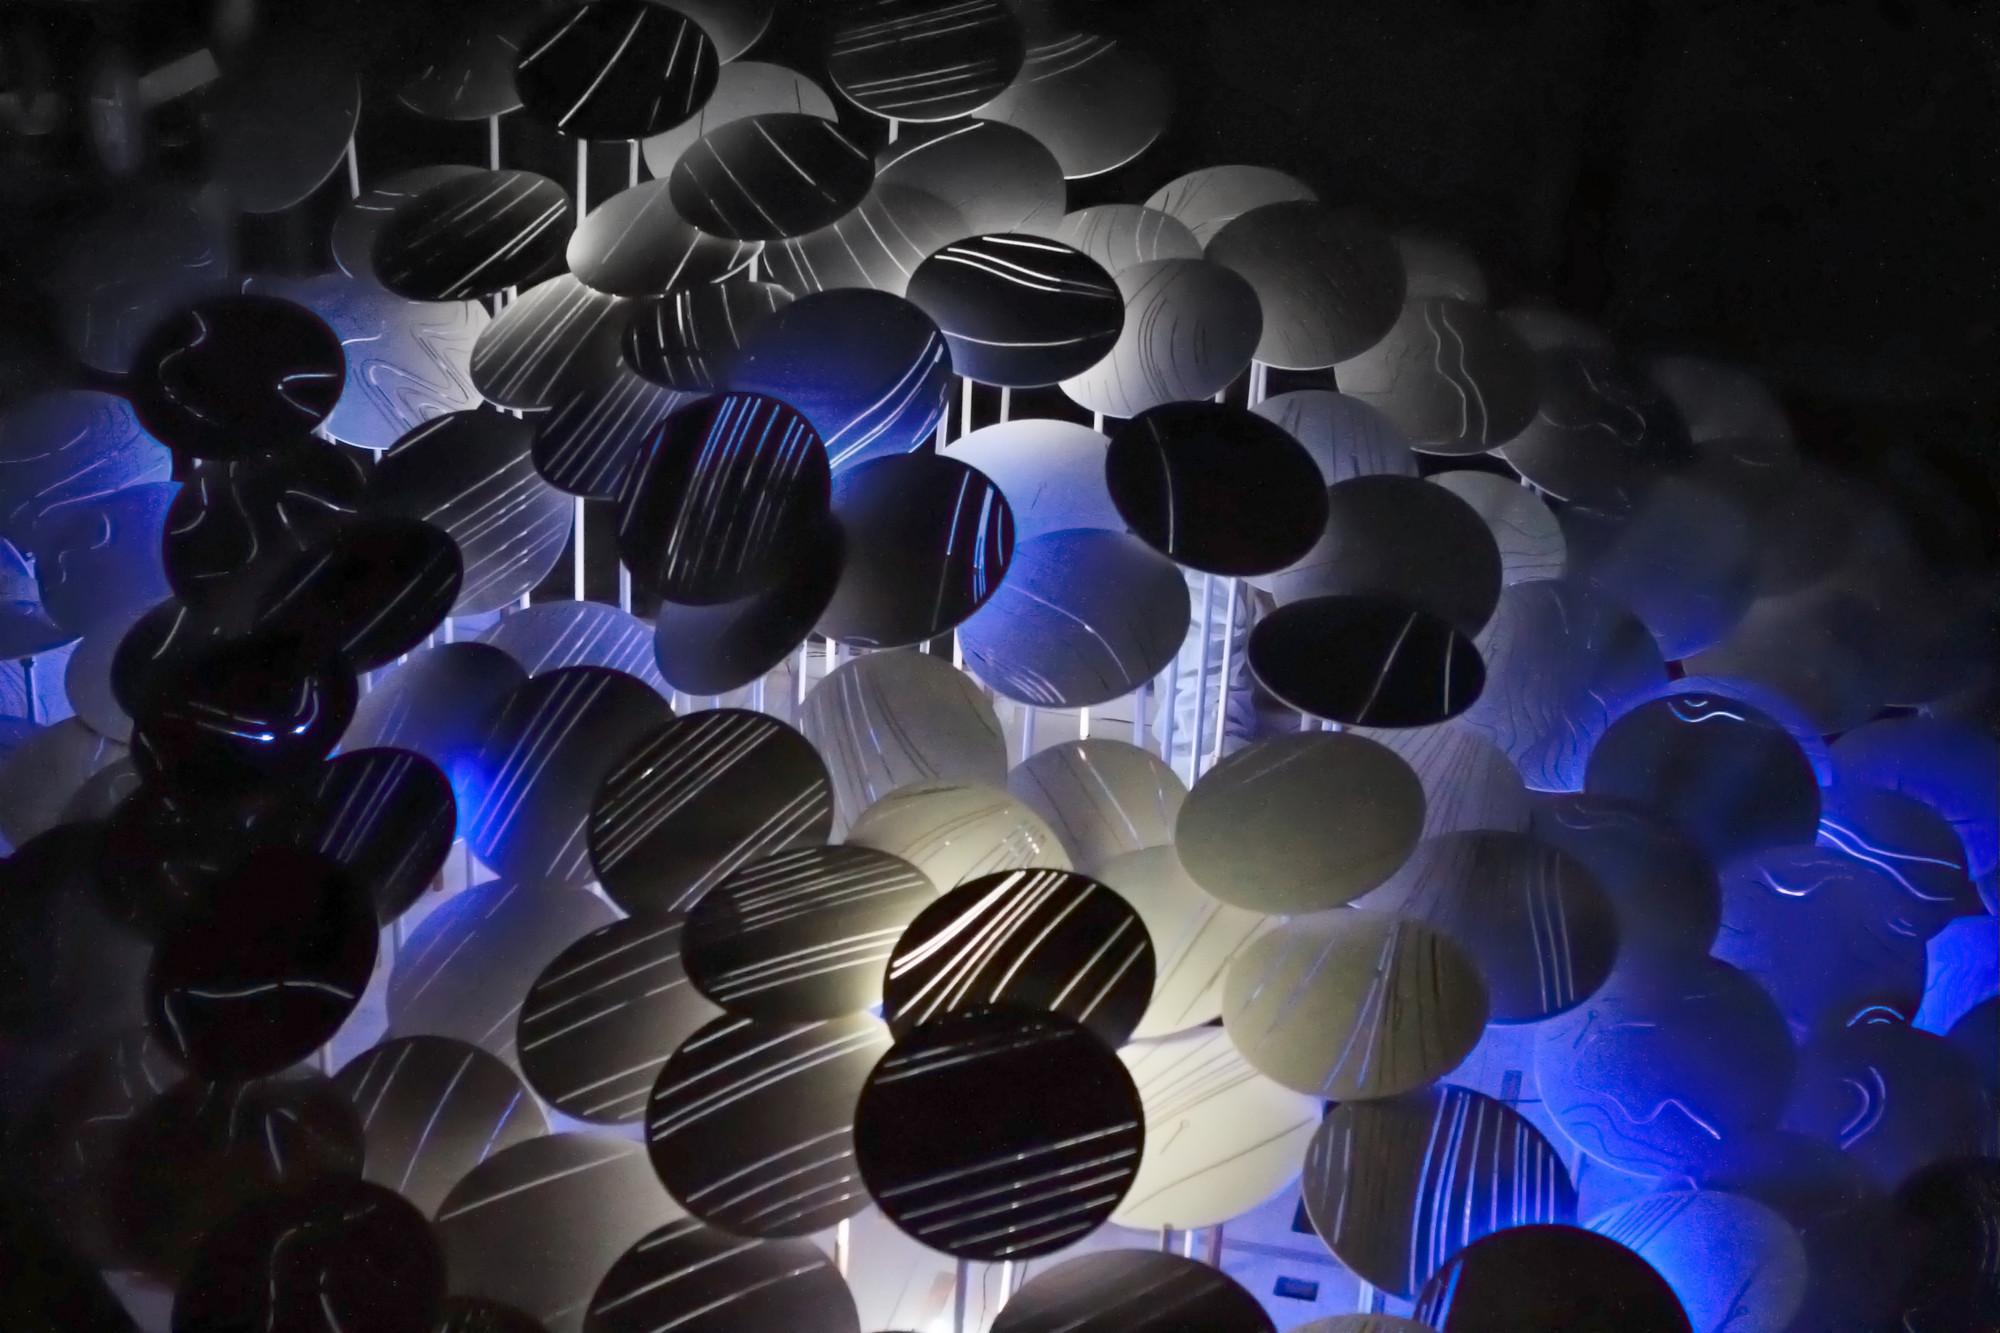 Instalación Light Forest, AA DLAB: Blue, Londres / Hooke Park, Julio - Agosto 2013 (foto: Carol Kan)